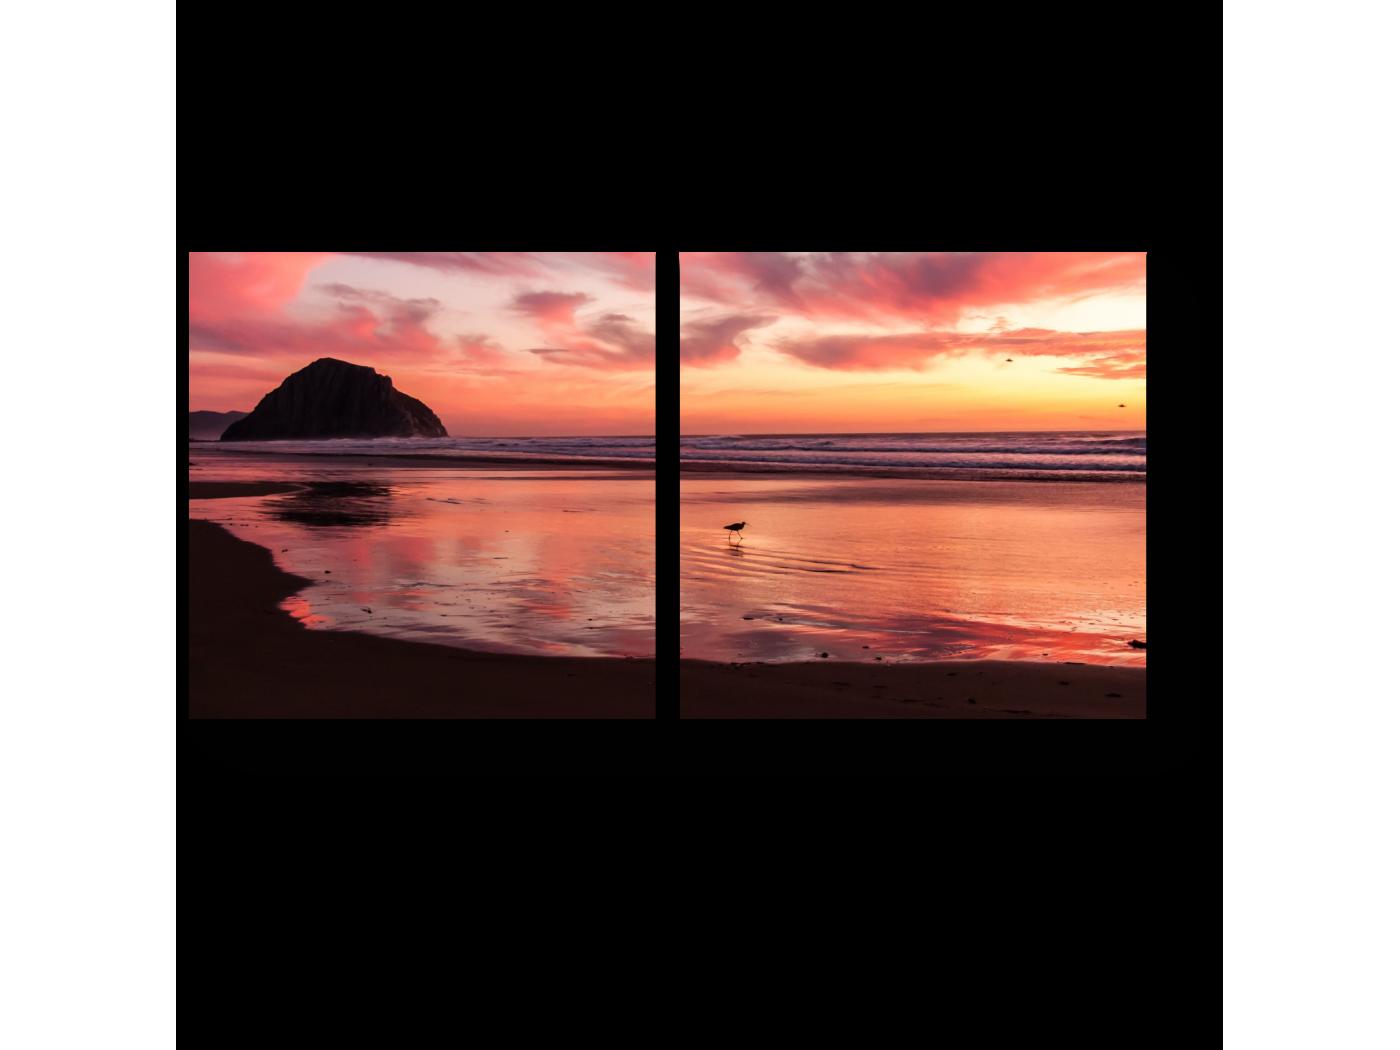 Модульная картина Алый закат (40x20) фото